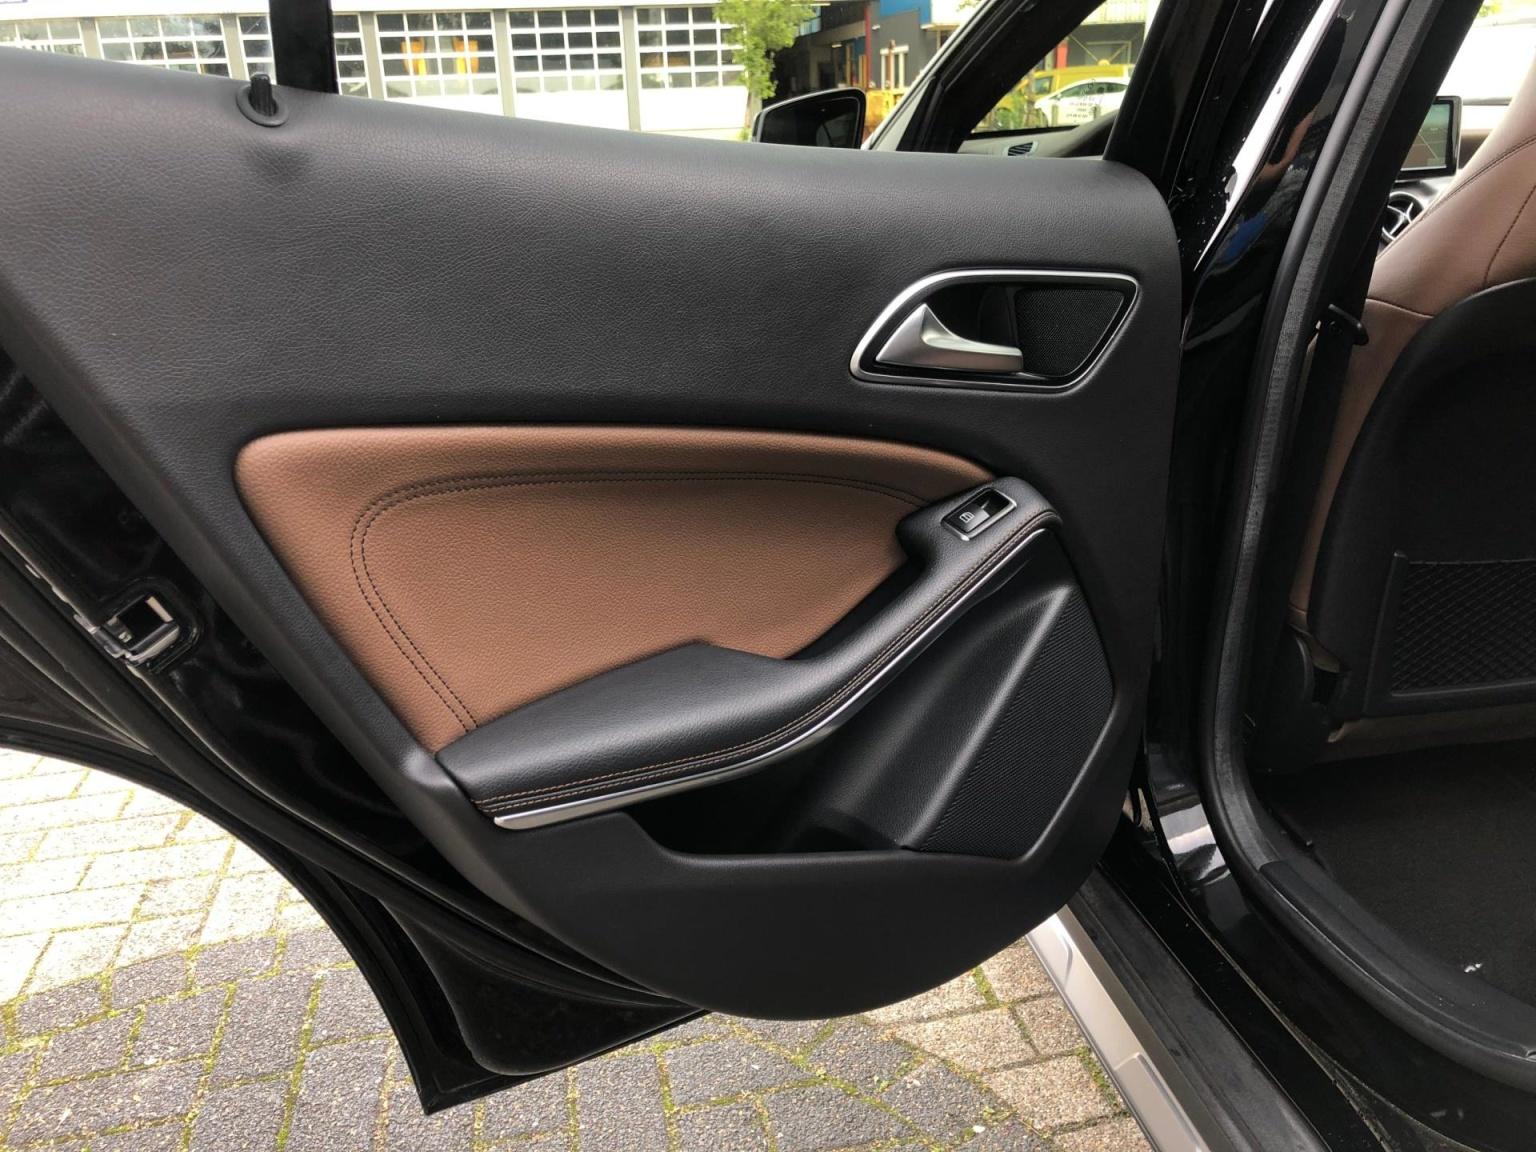 Mercedes-Benz-GLA-17